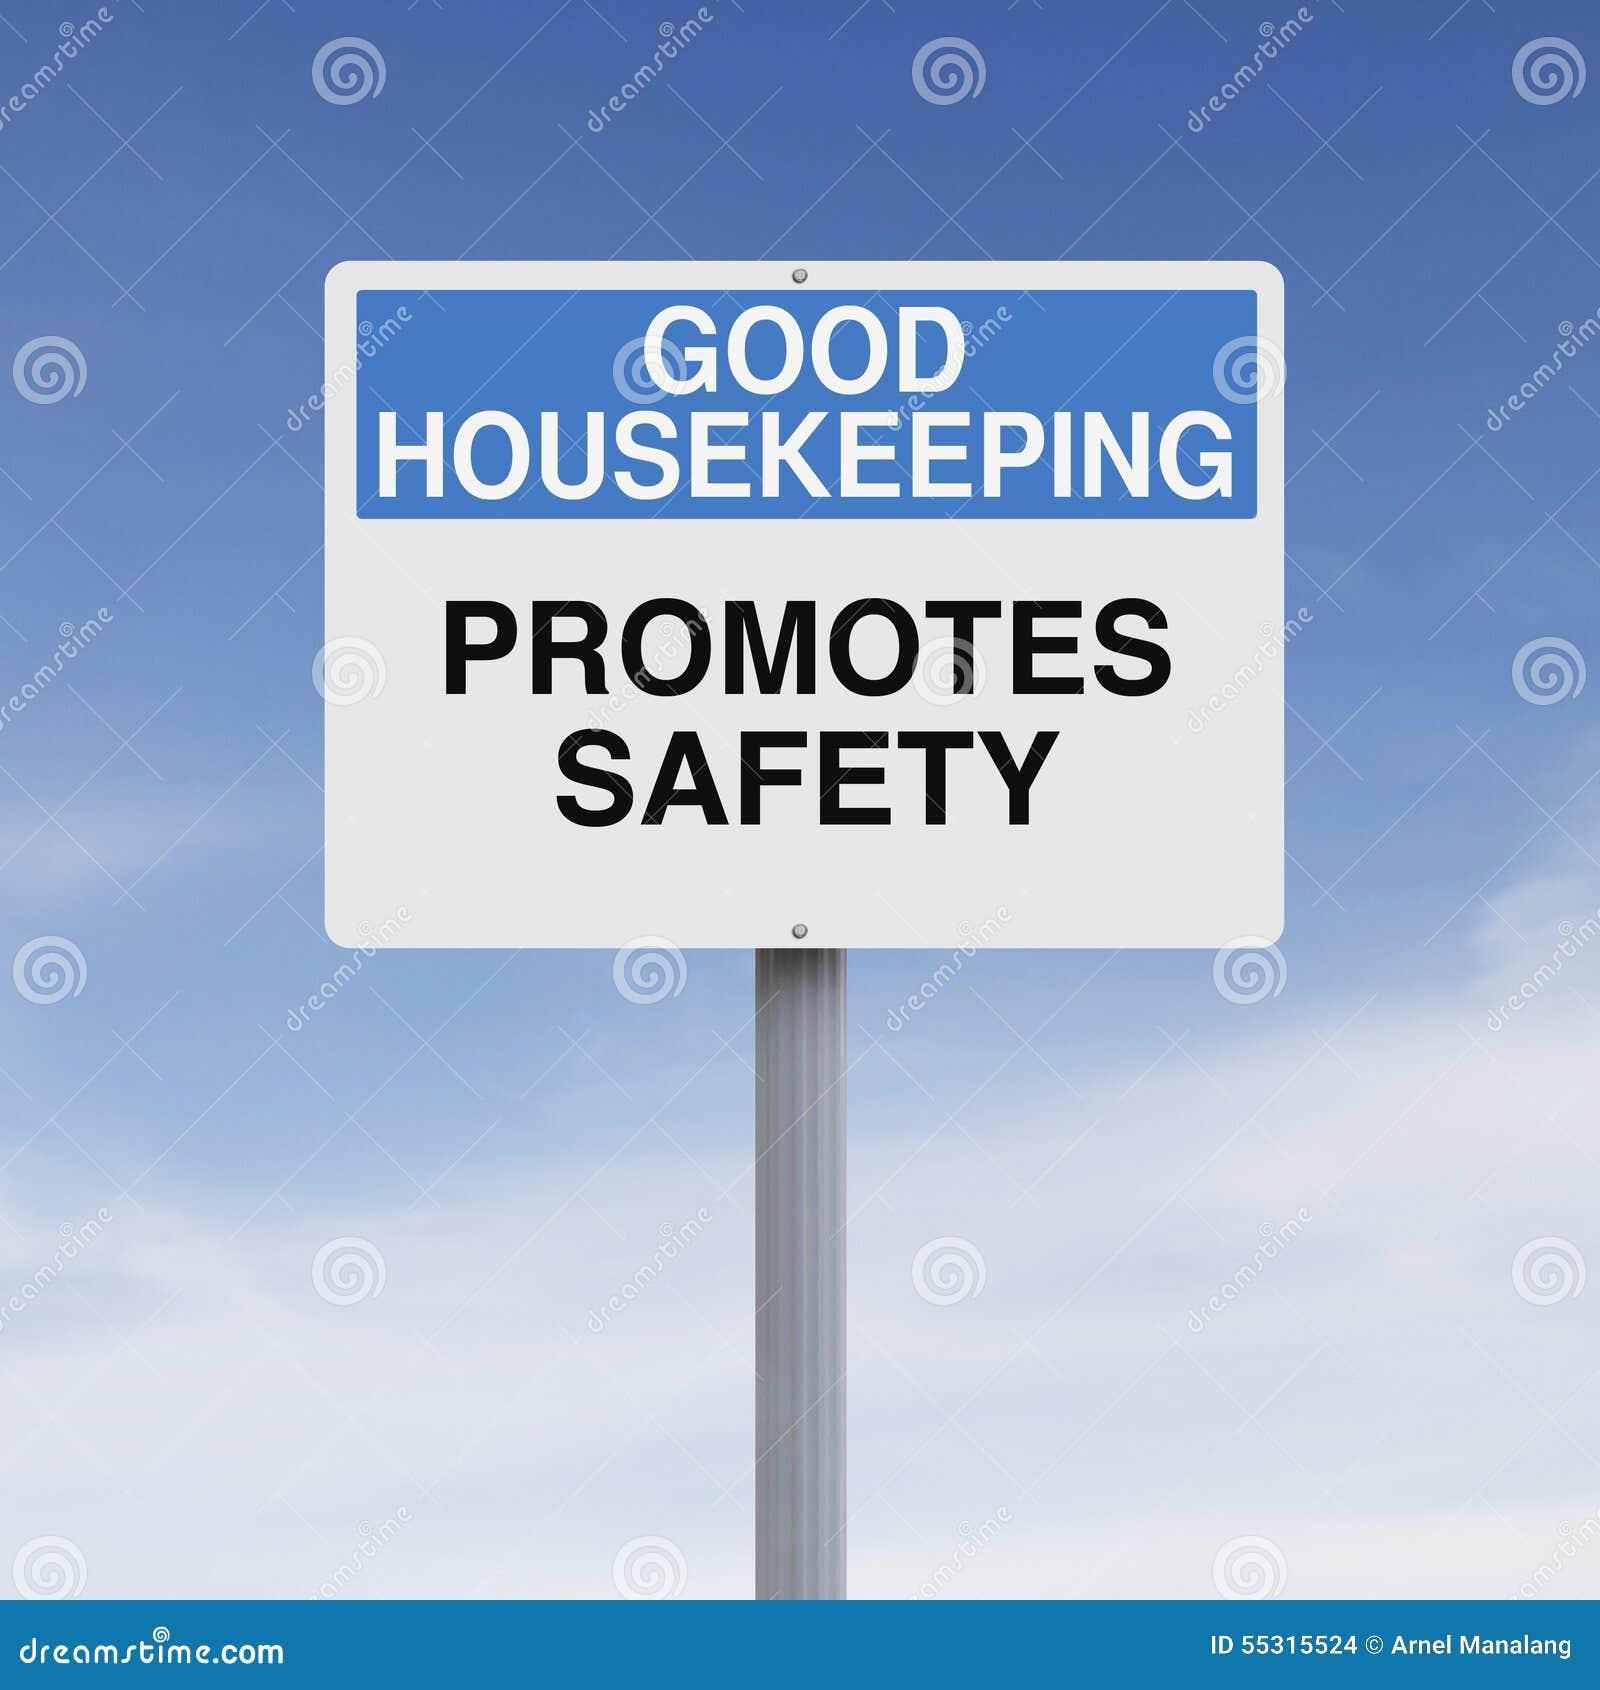 Good Housekeeping: Good Housekeeping Stock Photo. Image Of Blue, Road